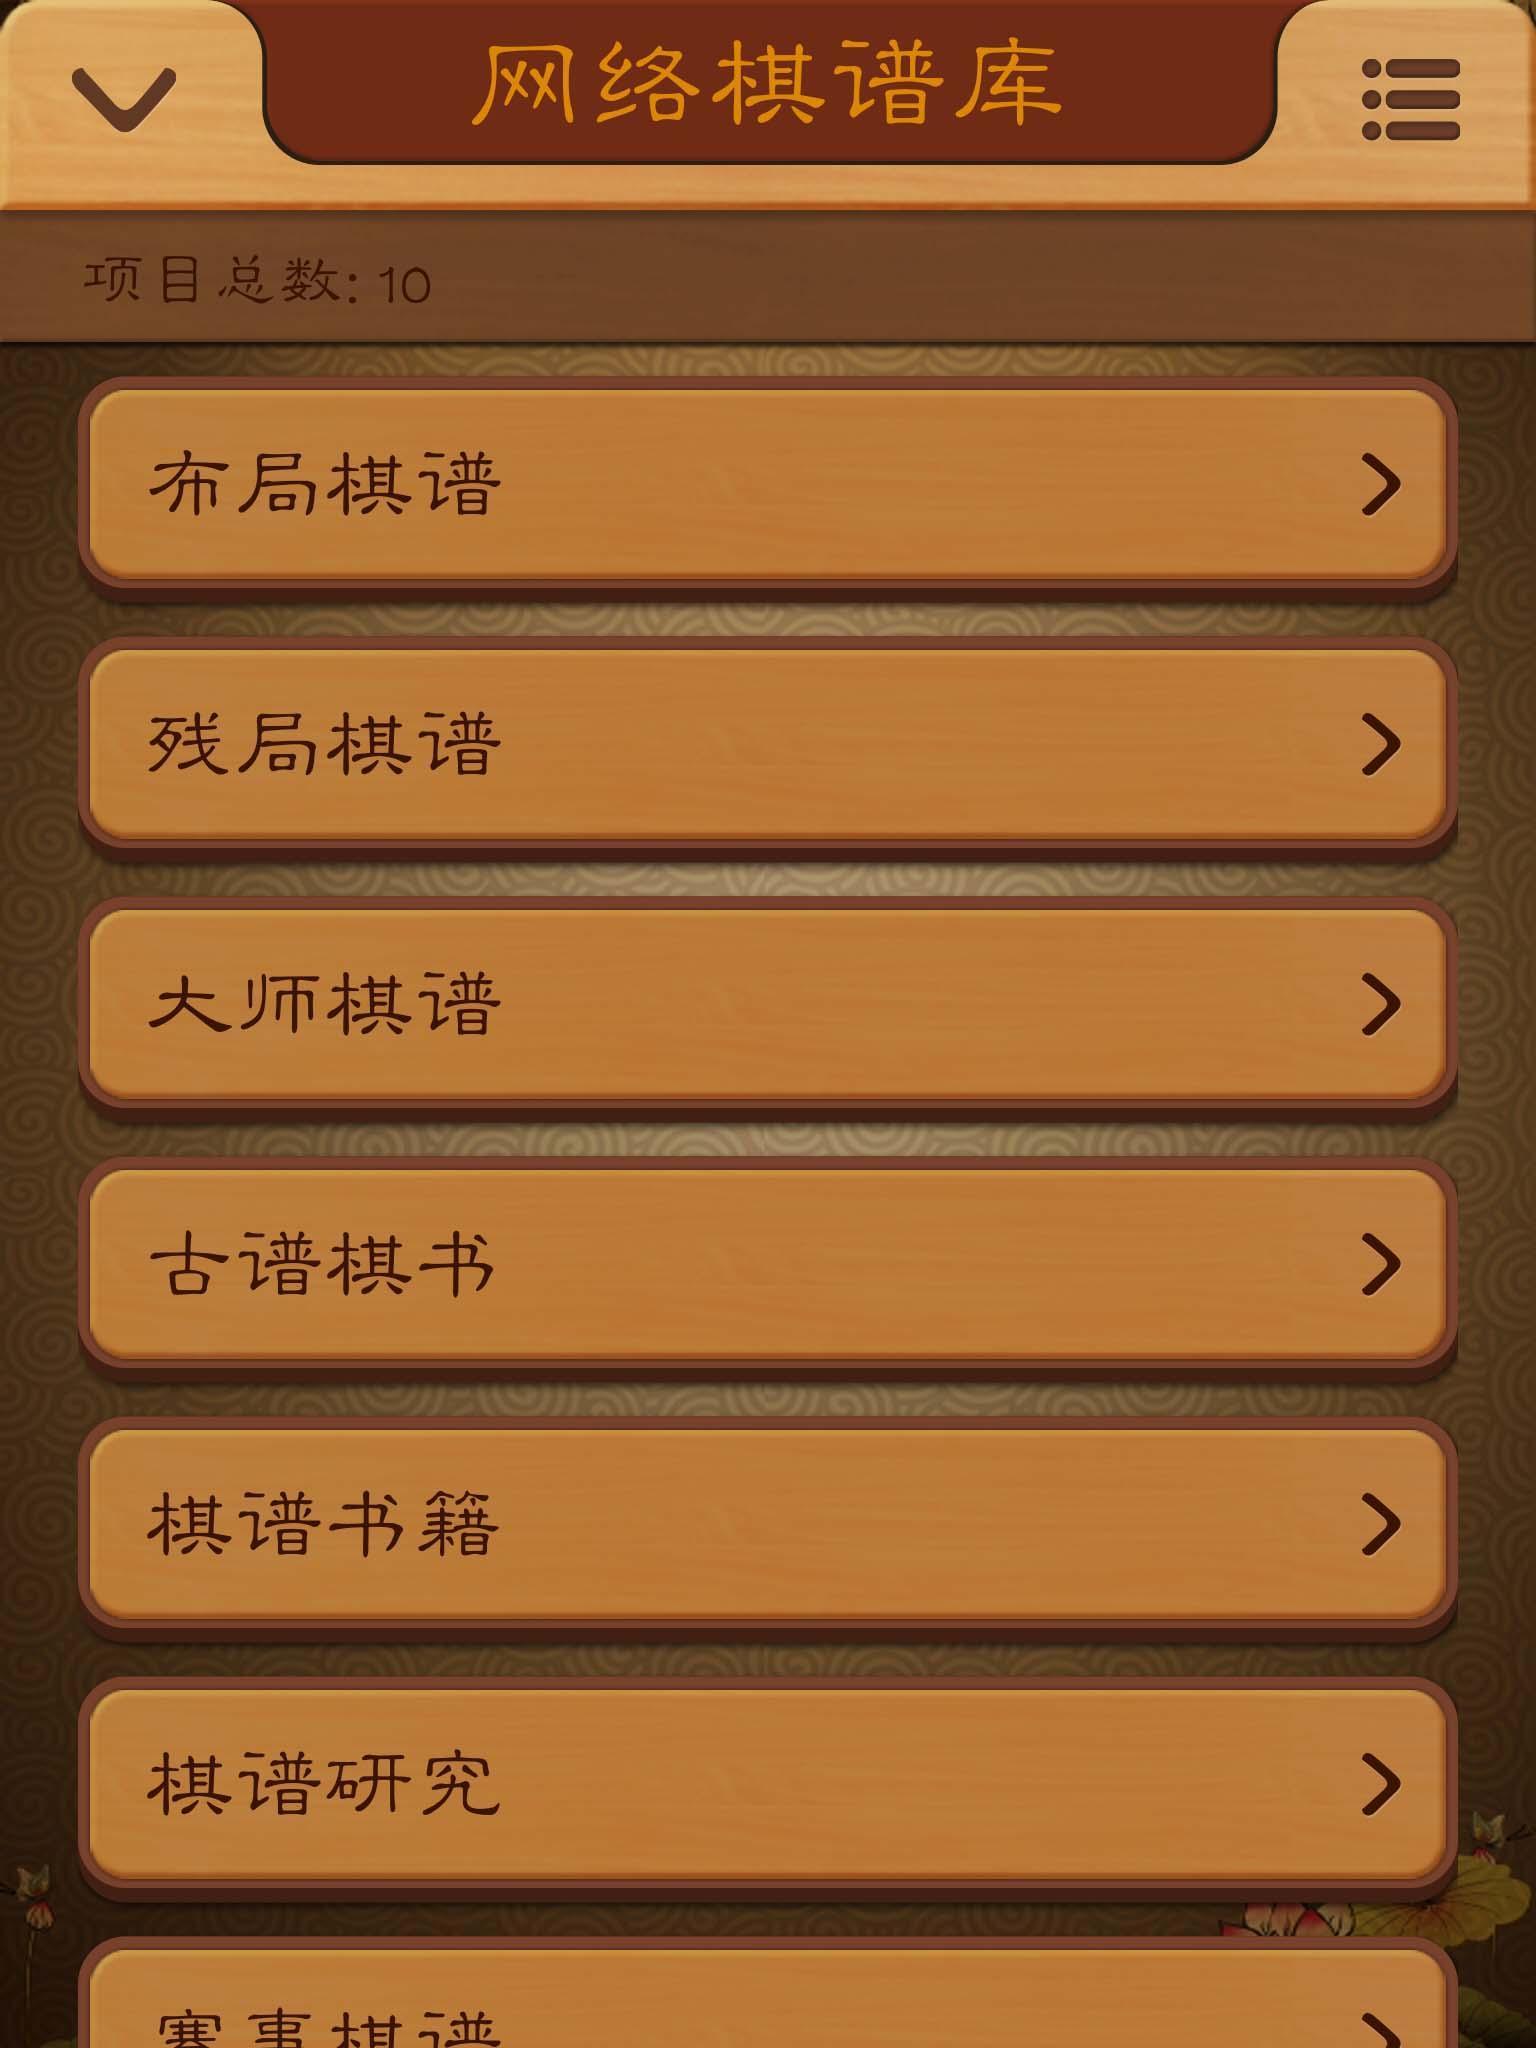 Chinese Chess, Xiangqi - many endgame and replay 3.9.6 Screenshot 11